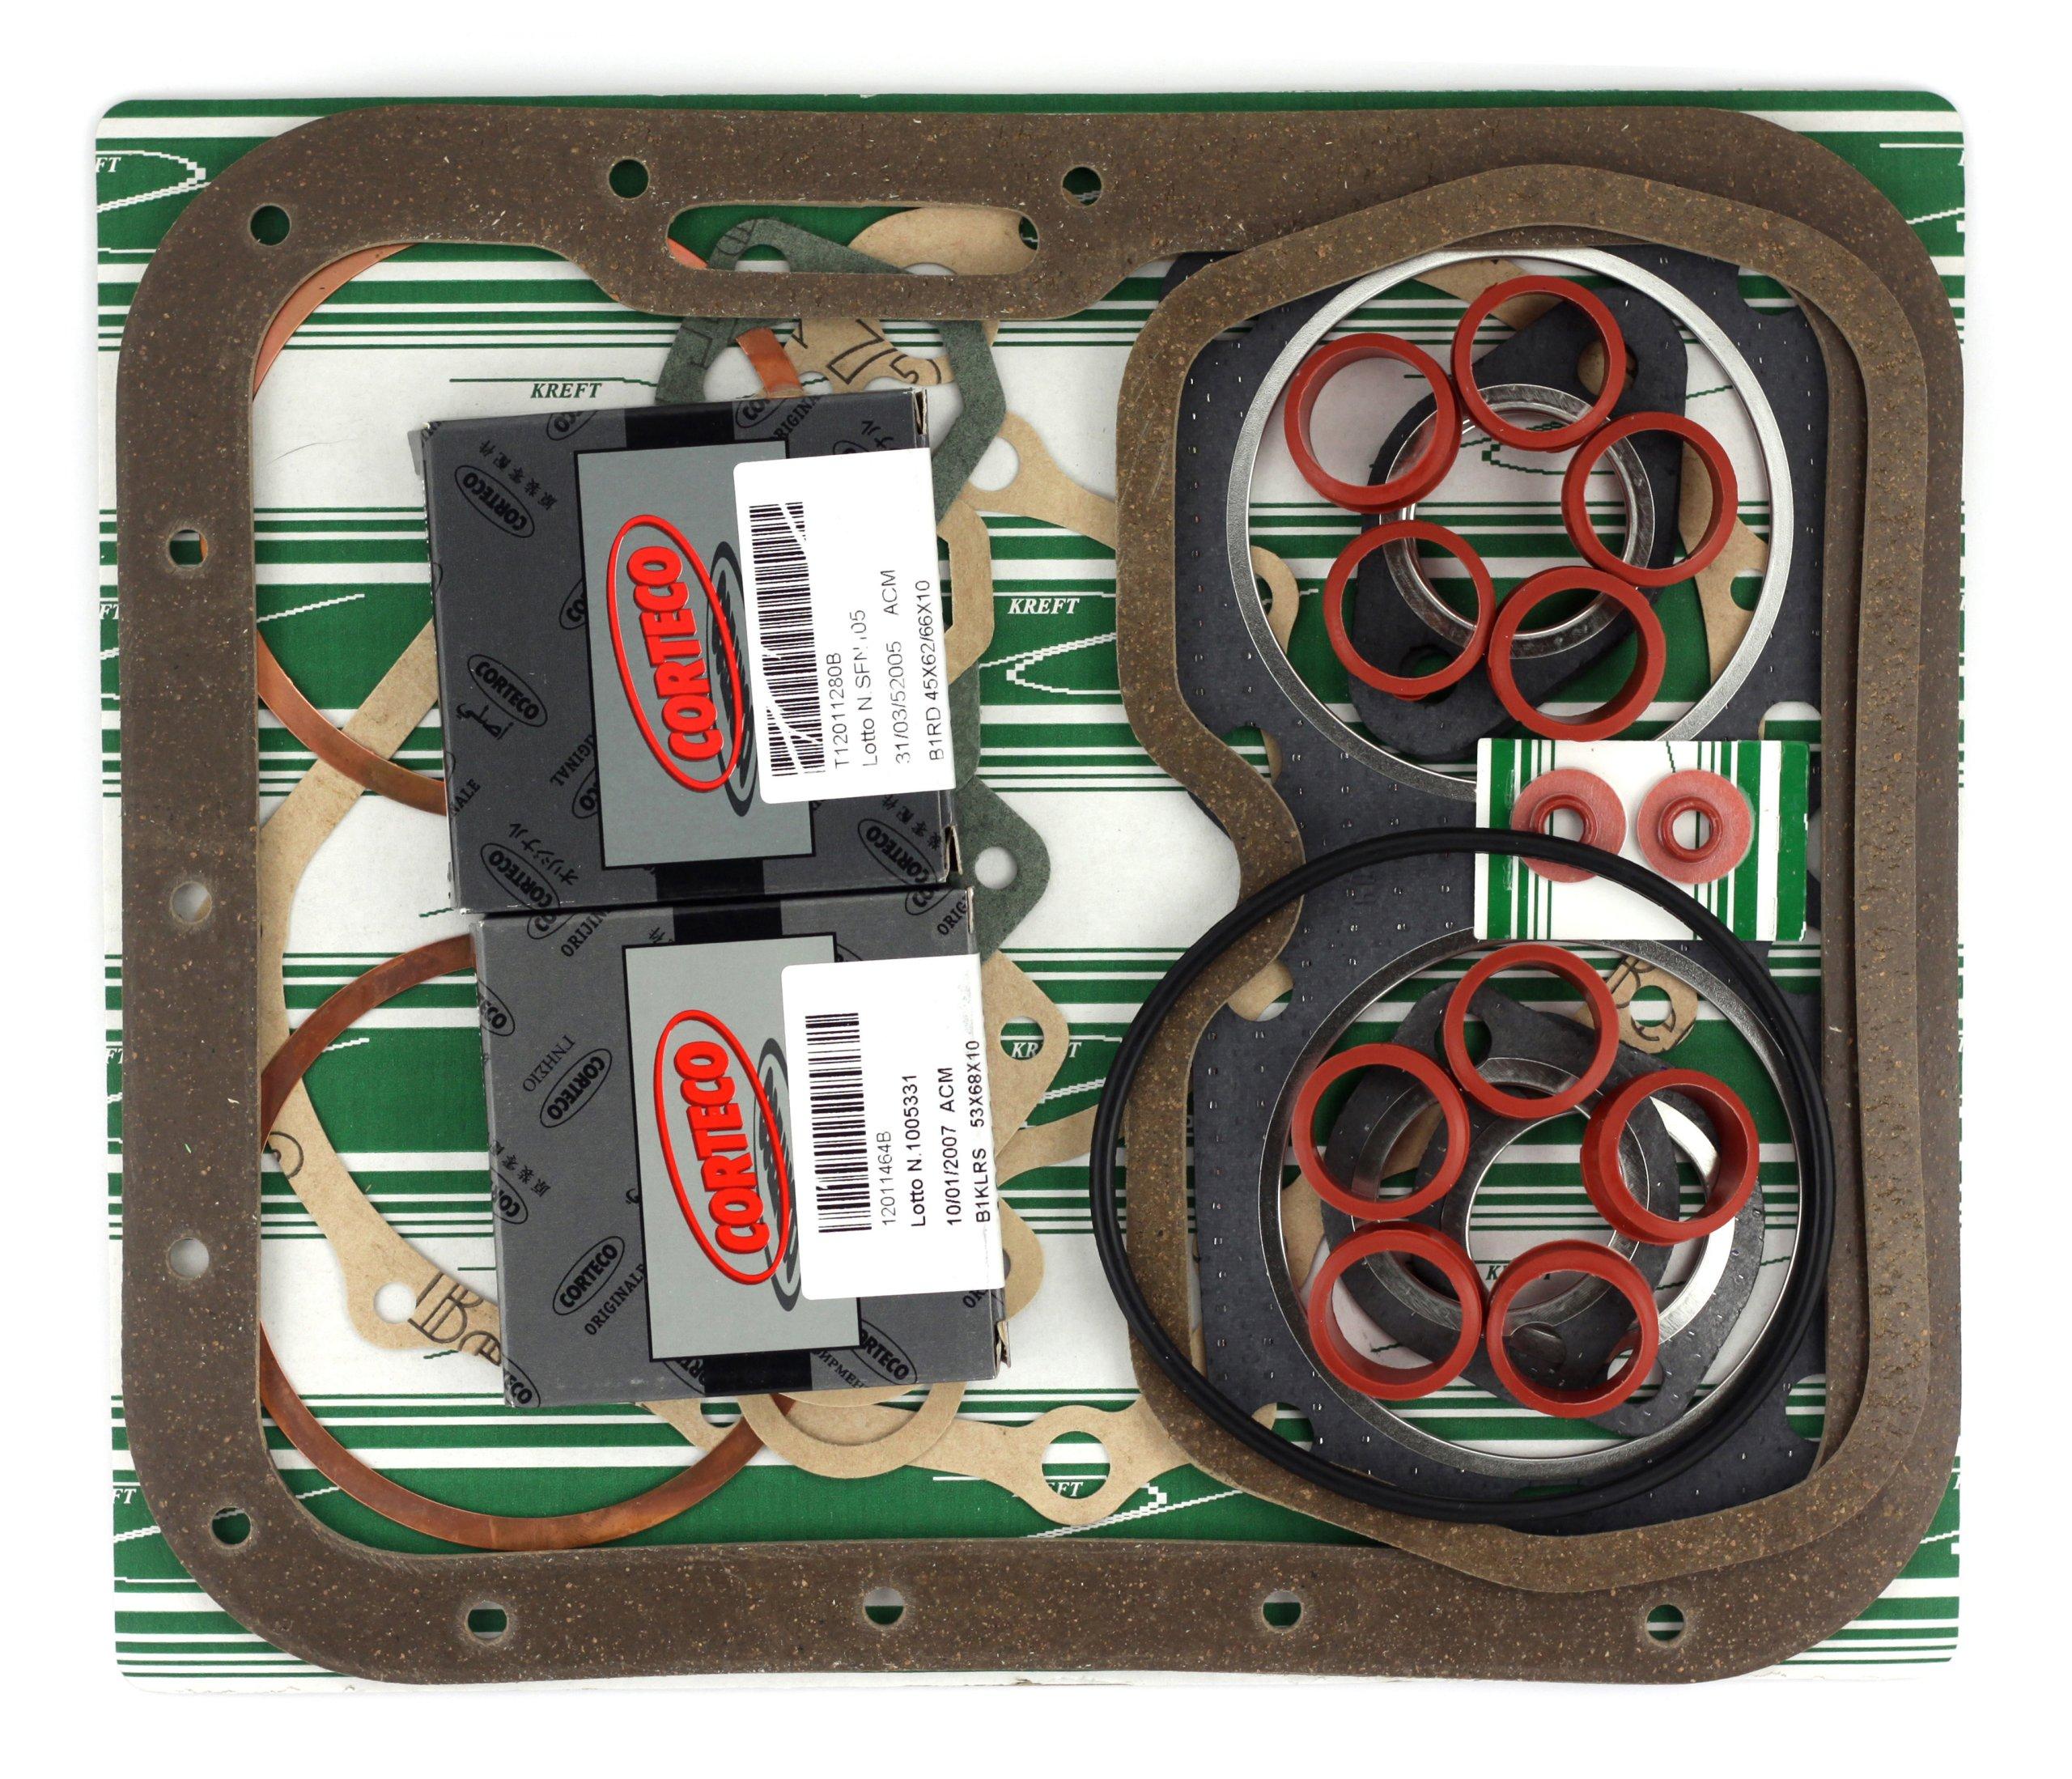 прокладки двигателя комплект fiat 126p 650 corteco